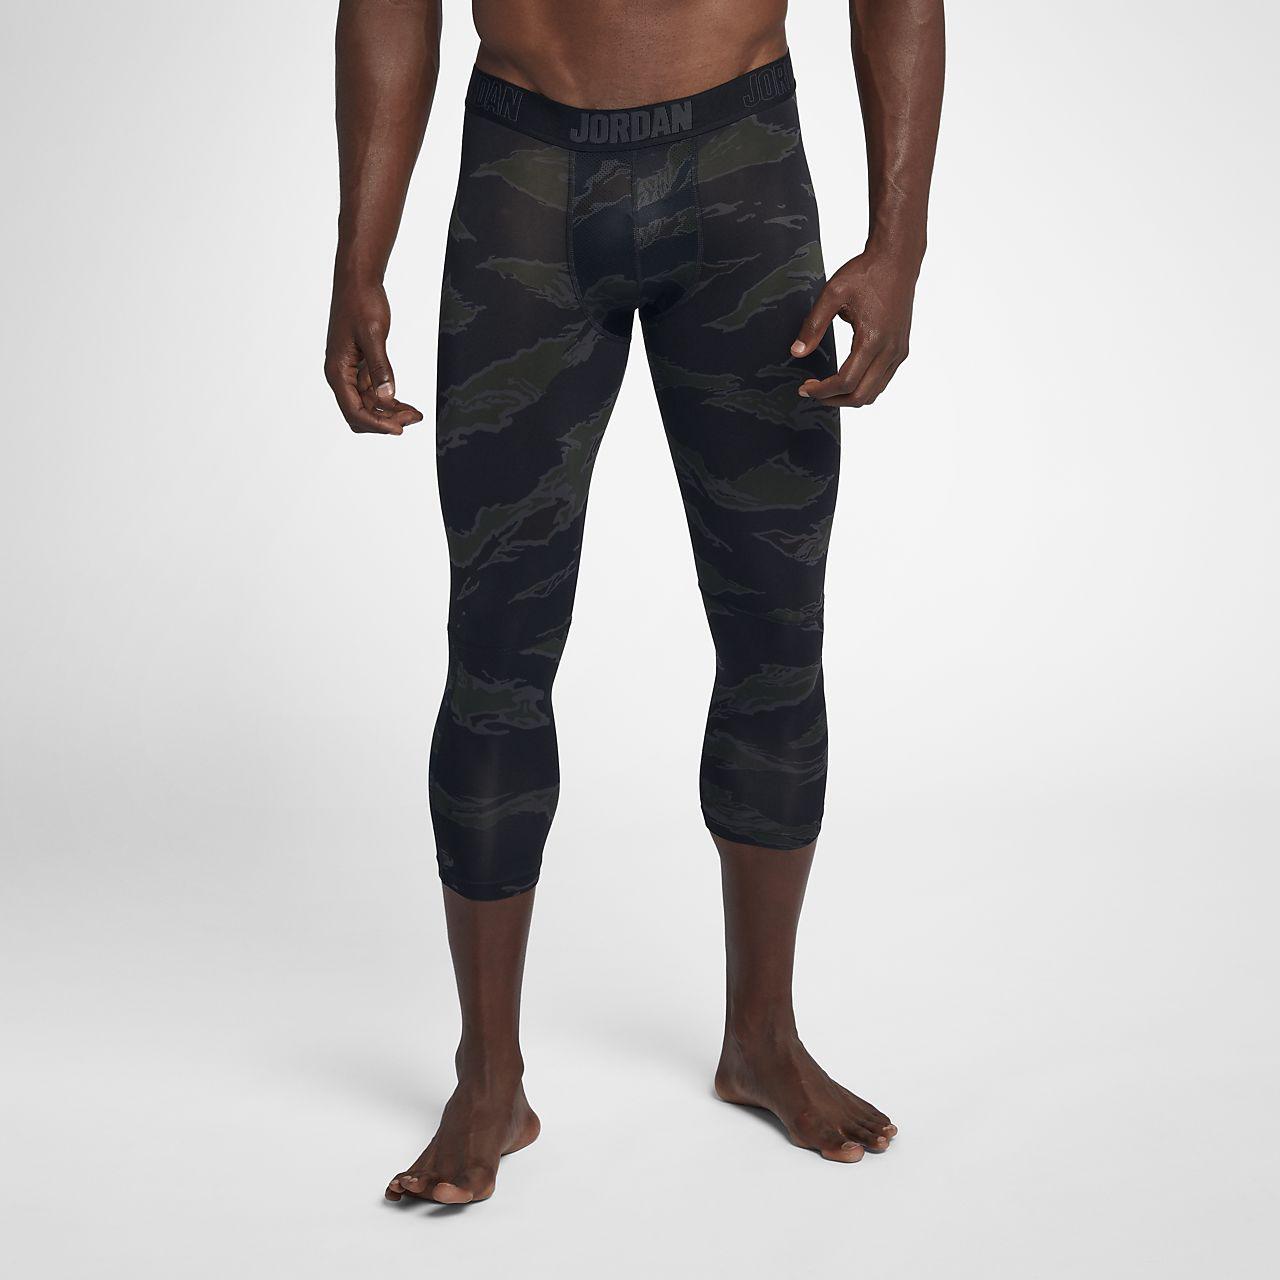 Jordan Dri-FIT 23 Alpha Men s Print 3 4 Training Tights. Nike.com 52f11d26c6